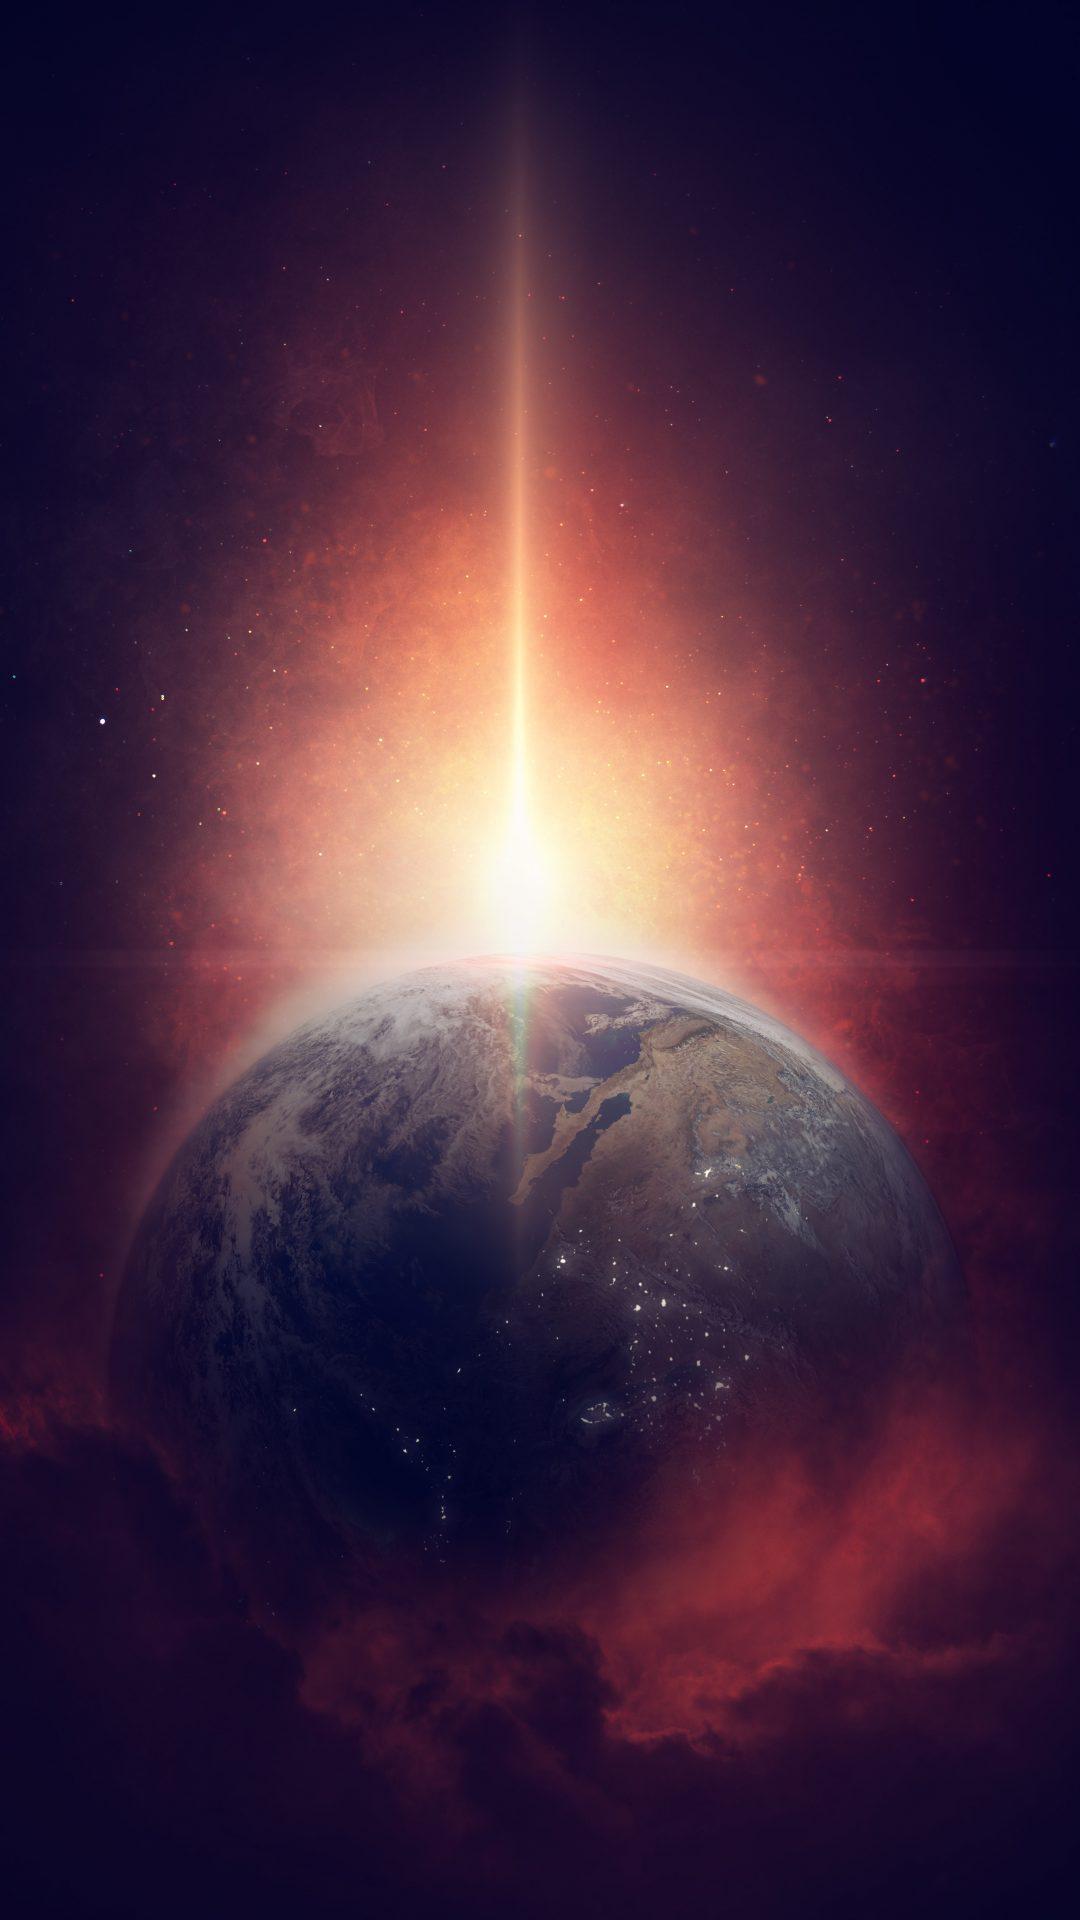 Cosmos Iphone X Wallpaper Fantasy Earth 4k Uhd Wallpaper